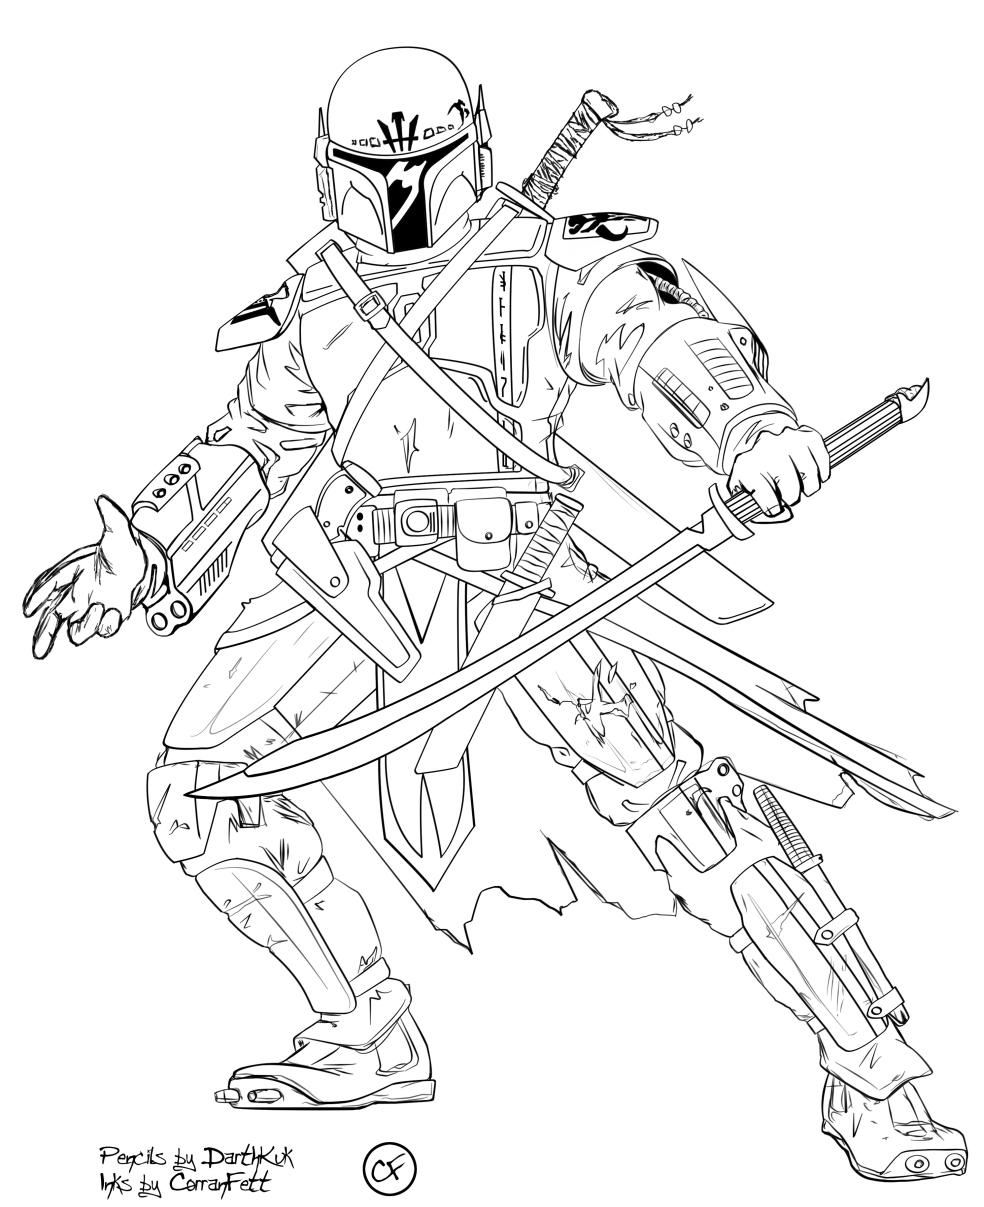 984x1207 Cool Darth Vader Coloring Page Darth Vader Coloring Pages